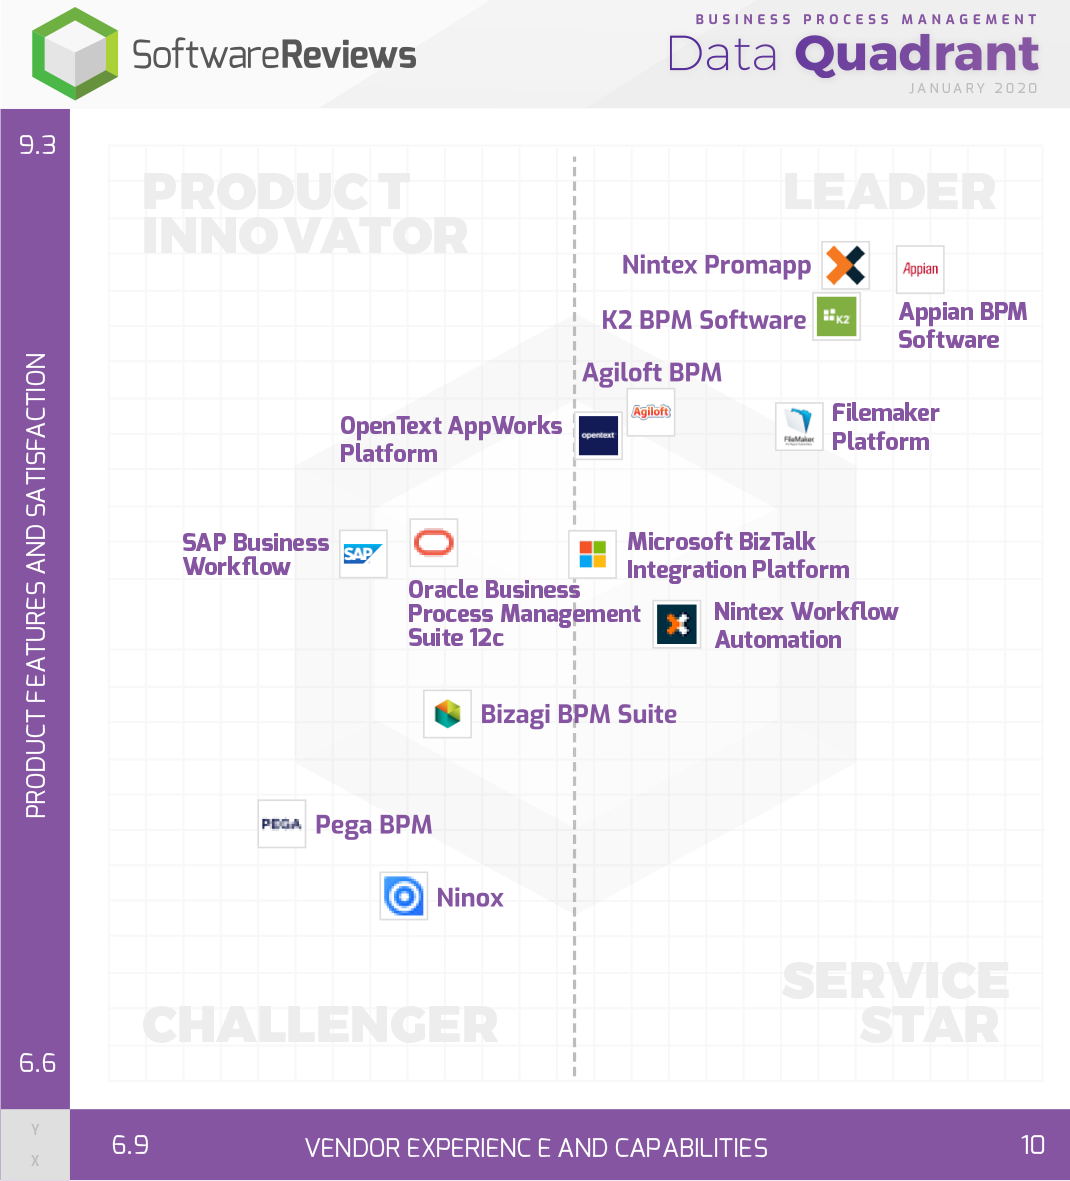 Business Process Management Data Quadrant